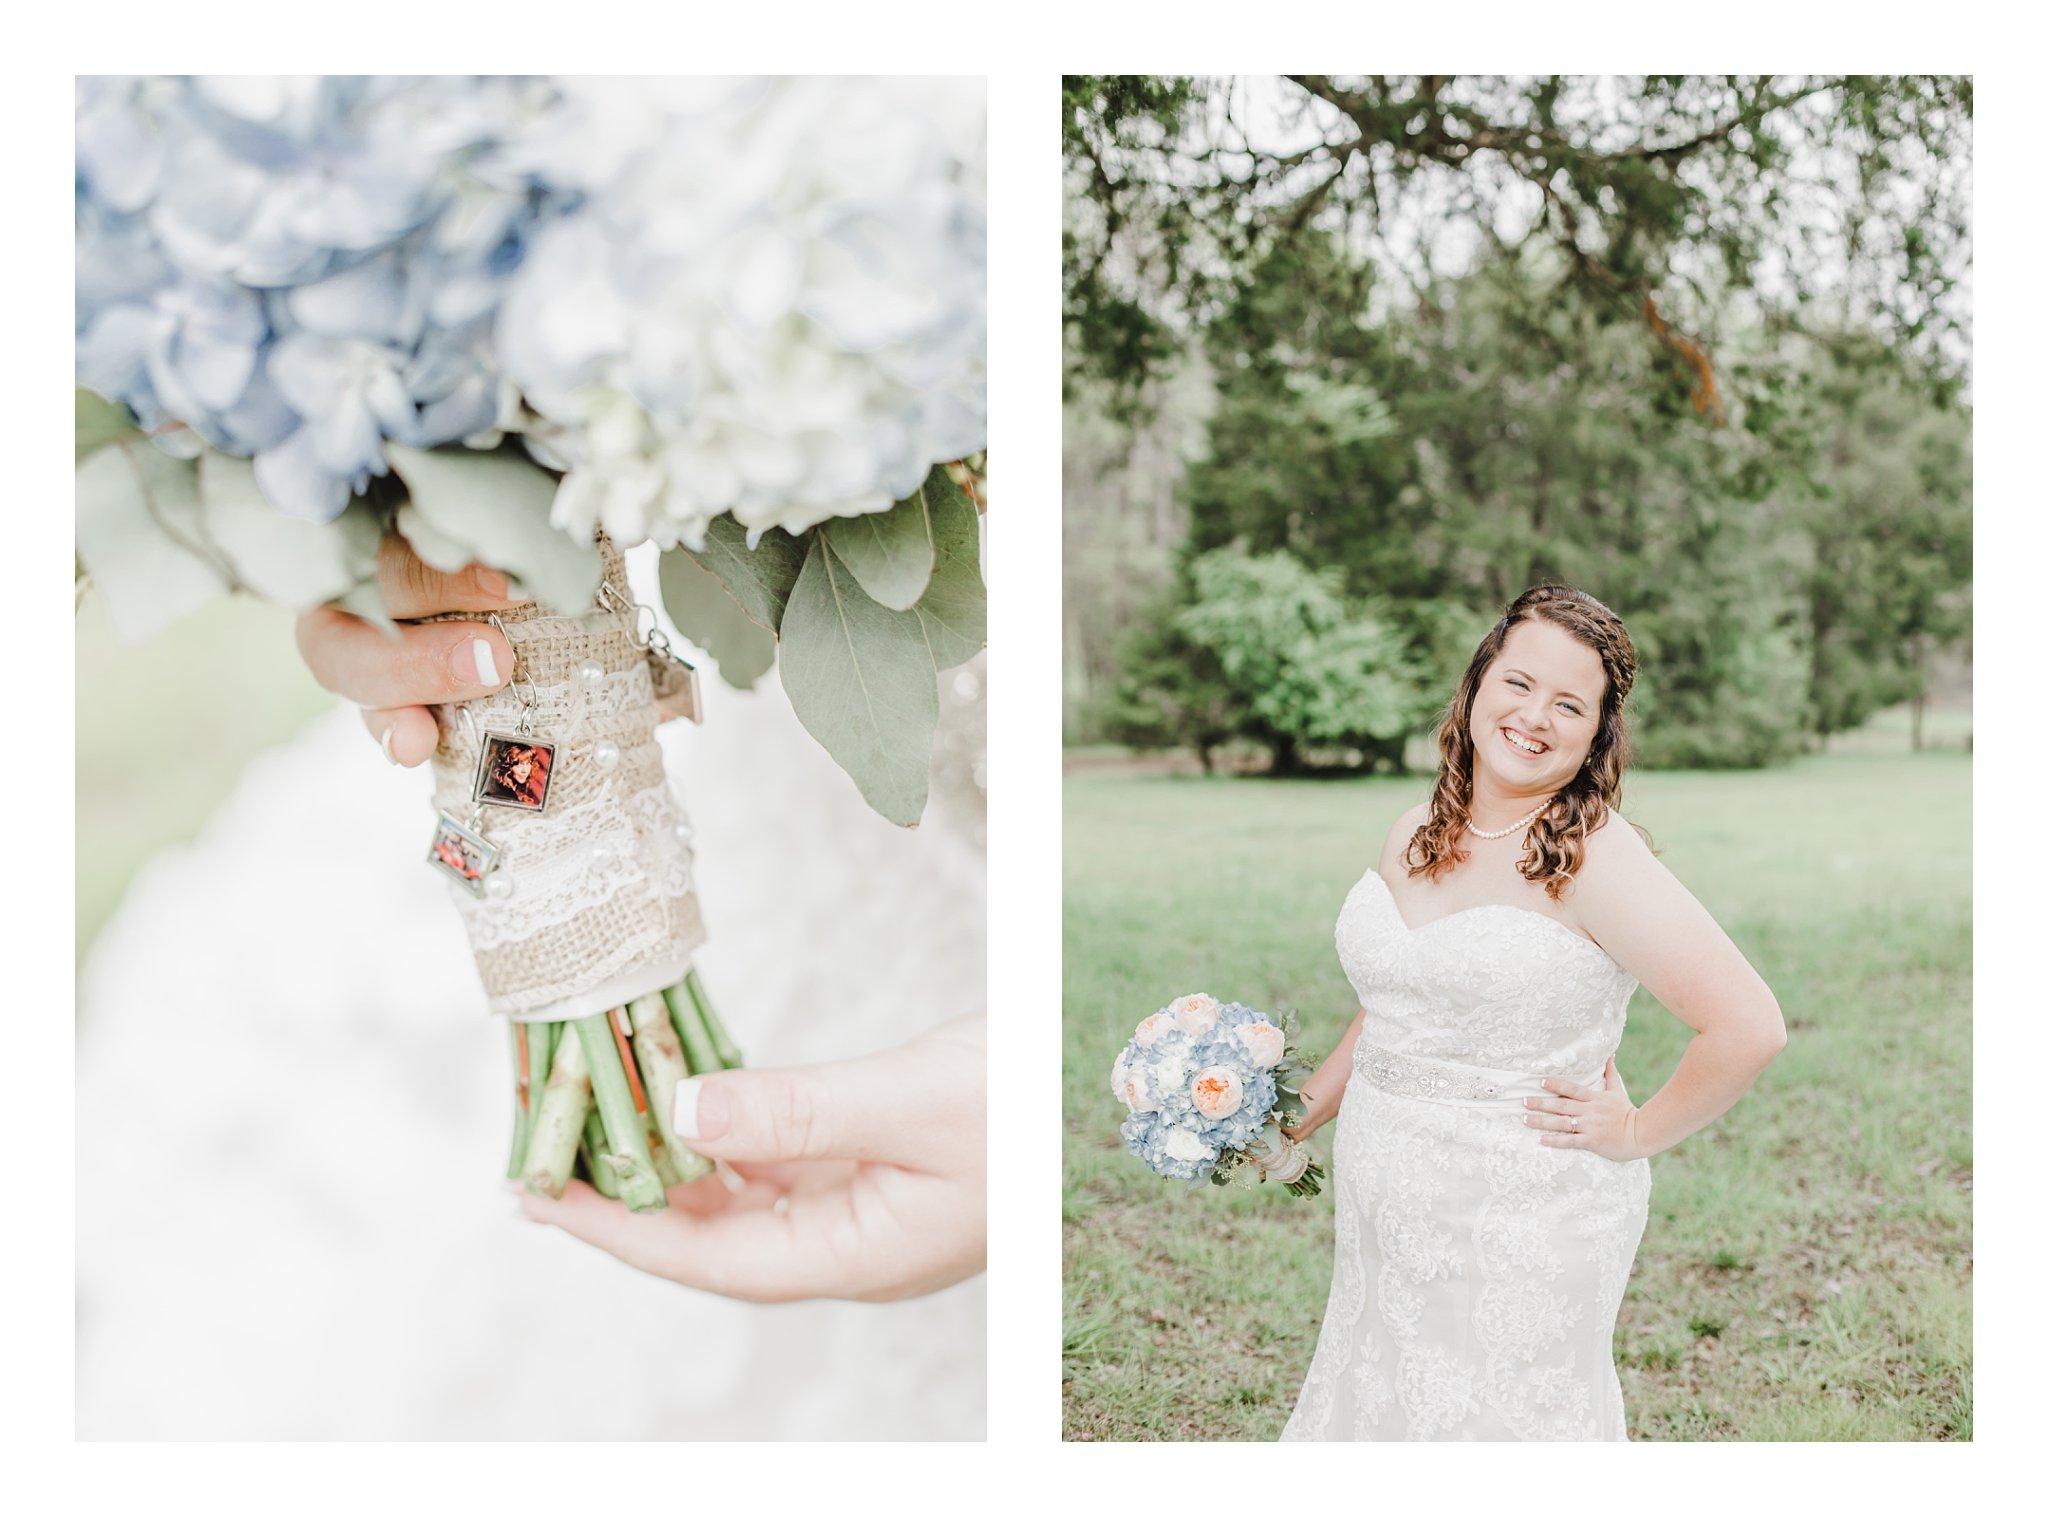 steel-blue-blush-spring-lace-gown-newberry-sc-wedding-photos-_0037.jpg